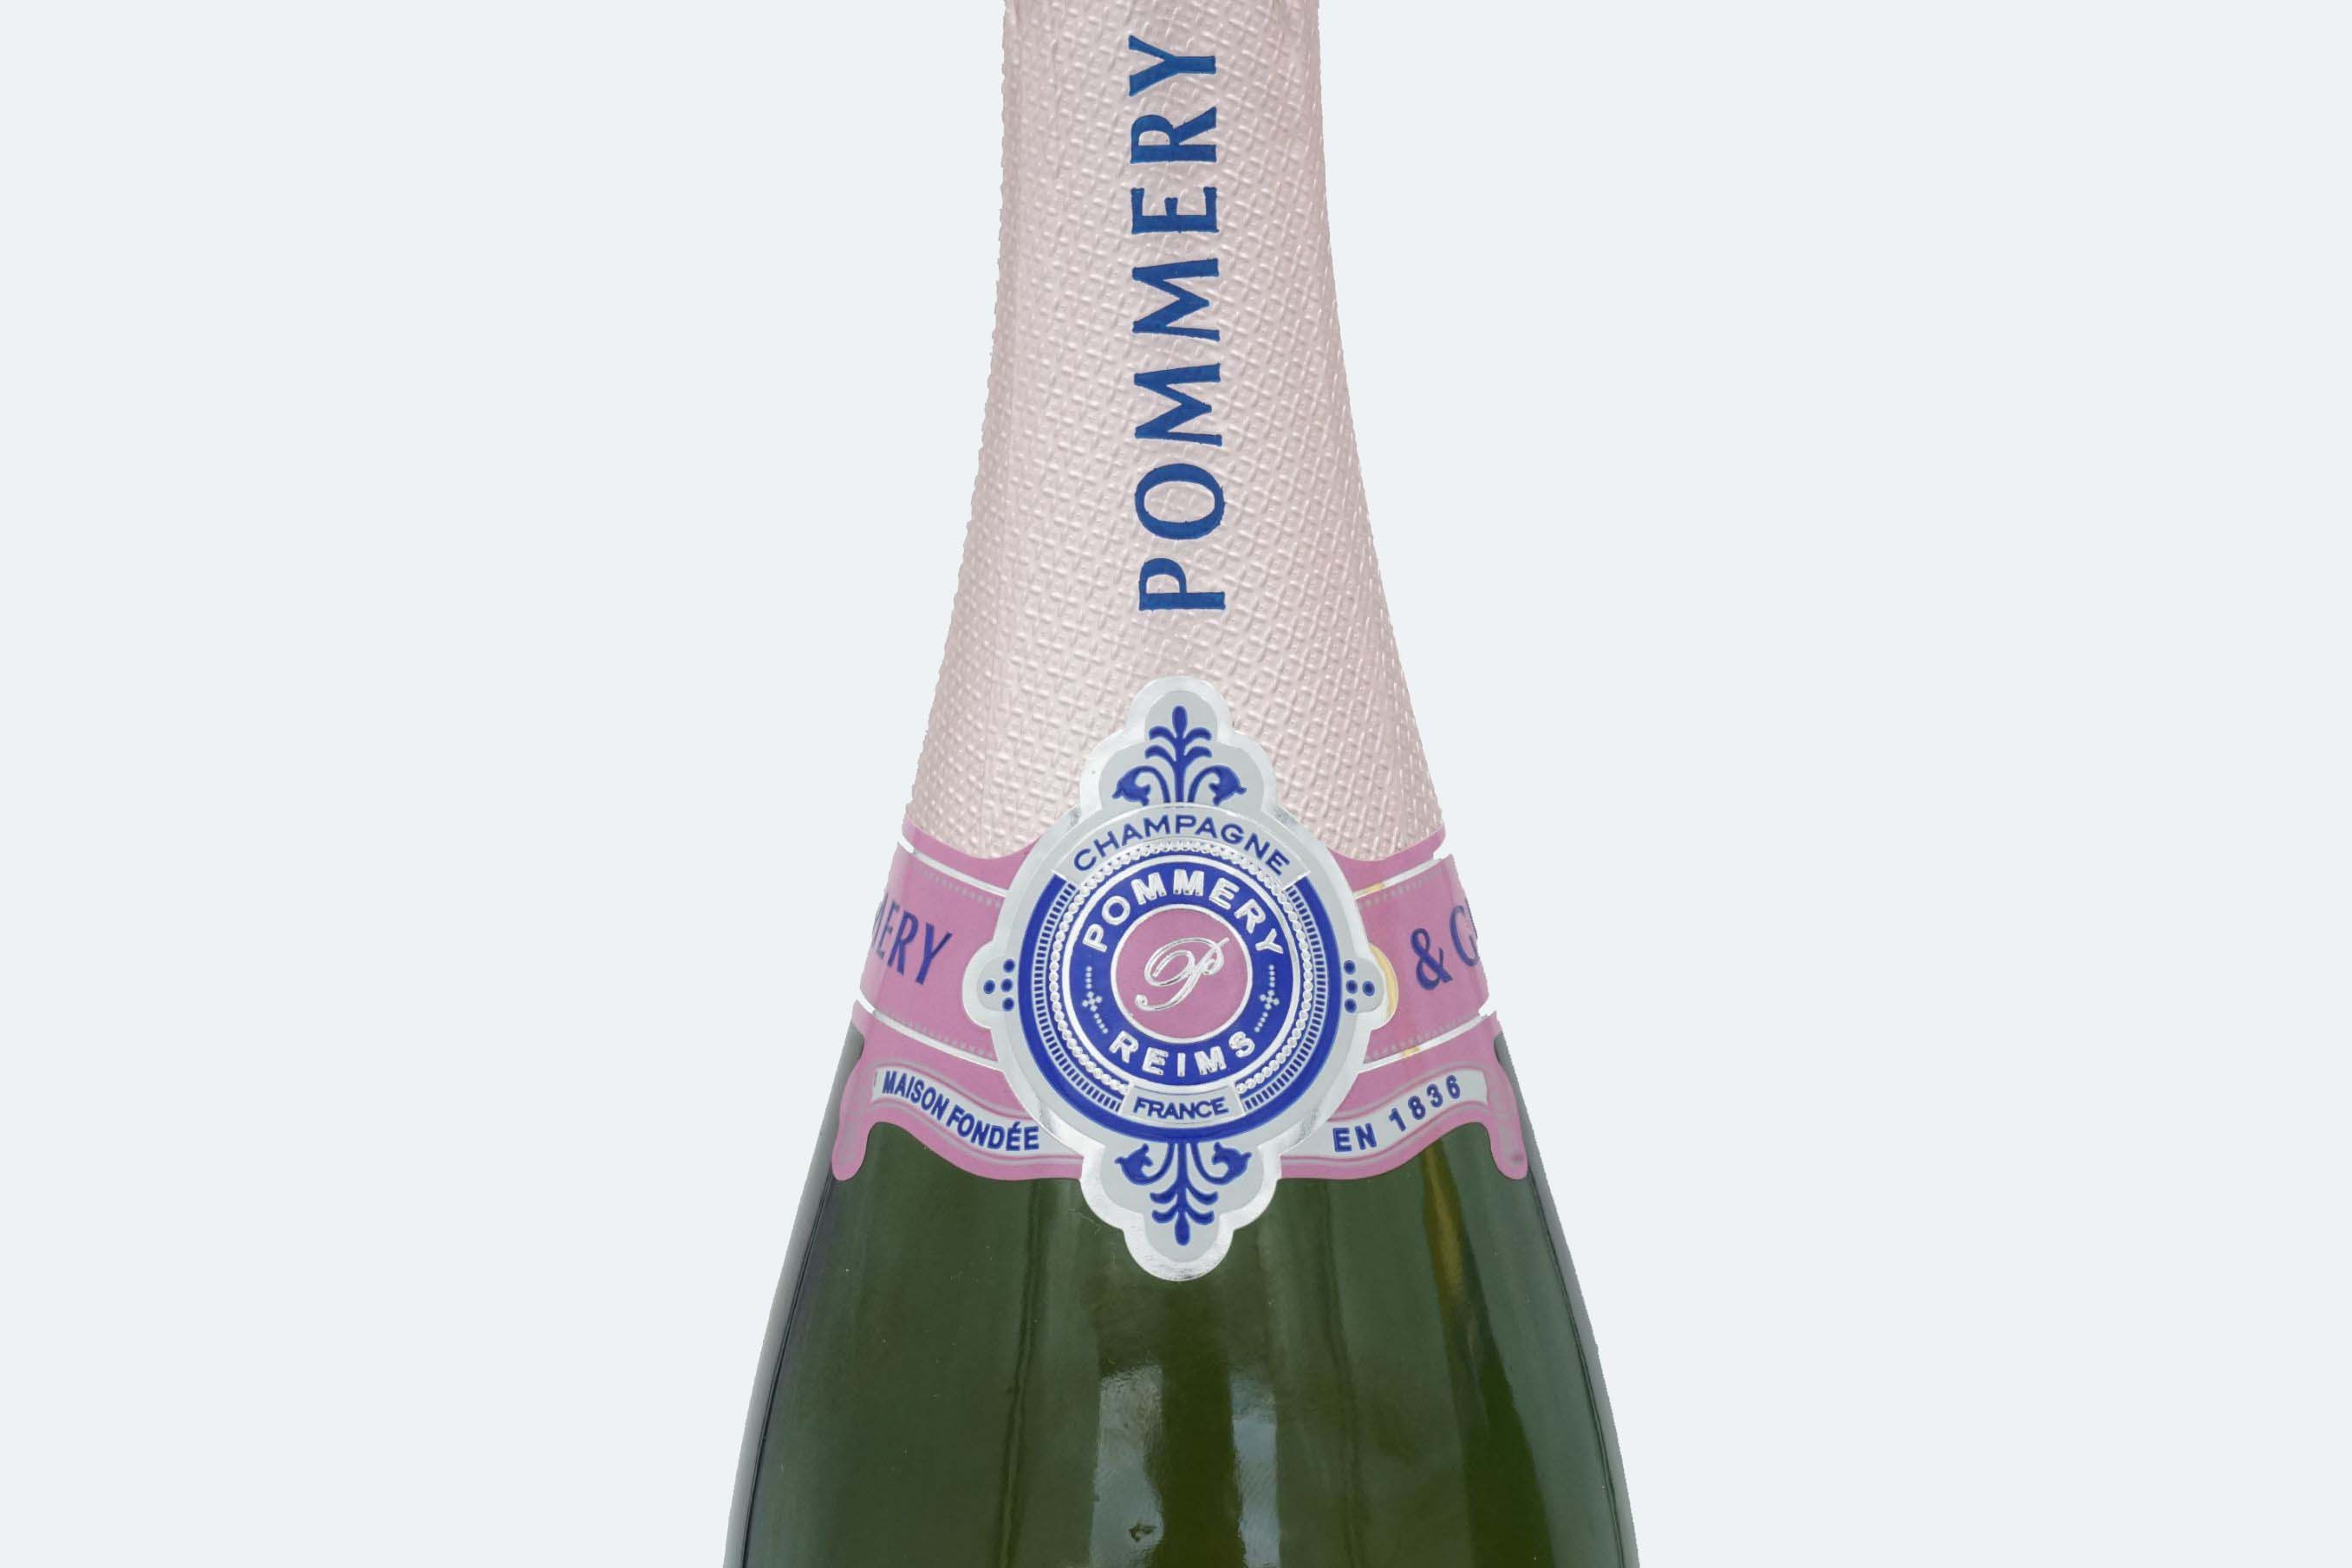 Champagne brut rosé Pommery...